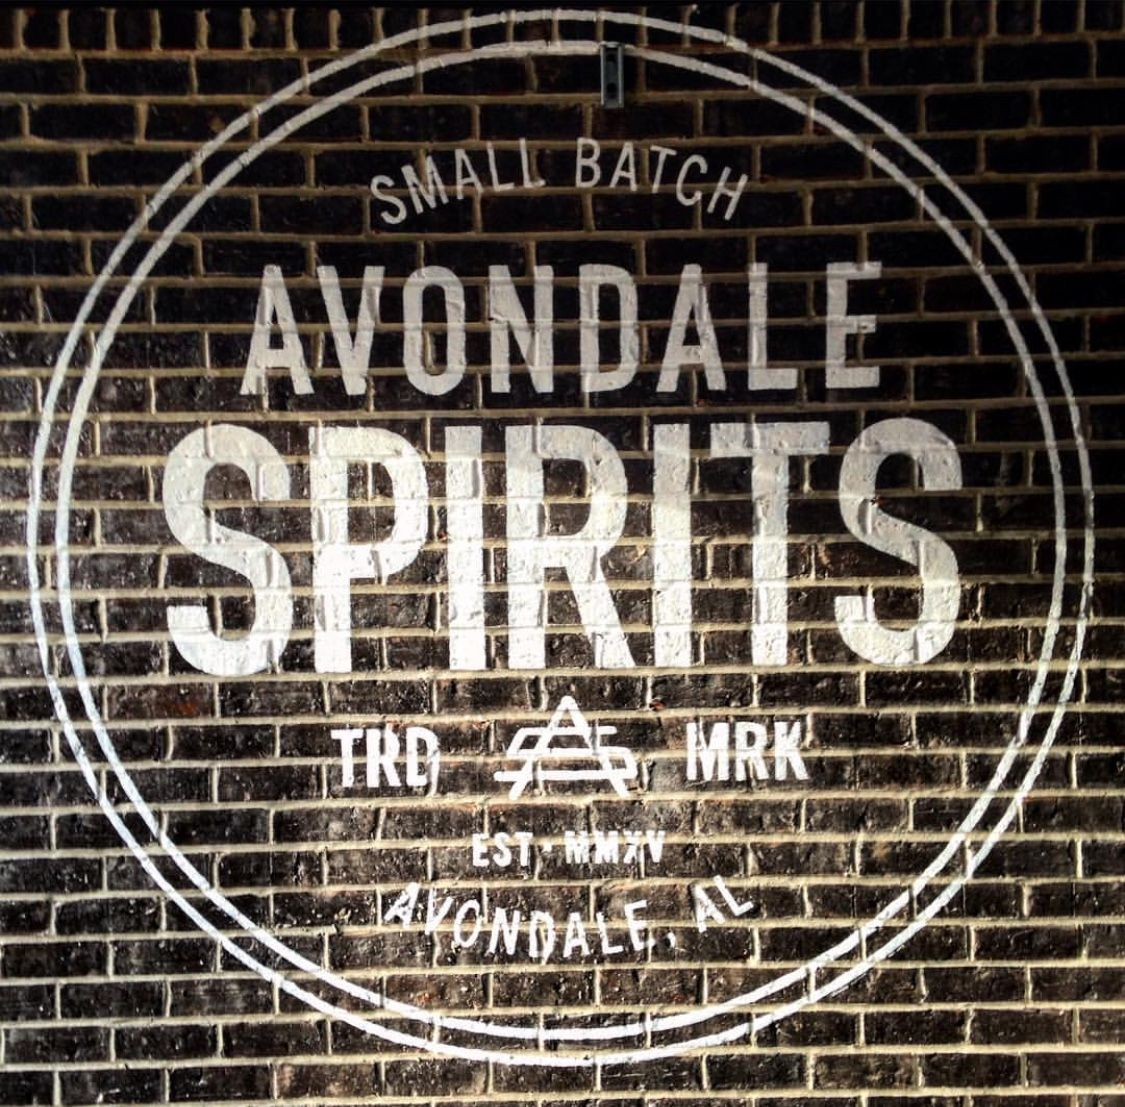 Avondale Spirits Bhm Al Avondale Birmingham Zoo Spirit